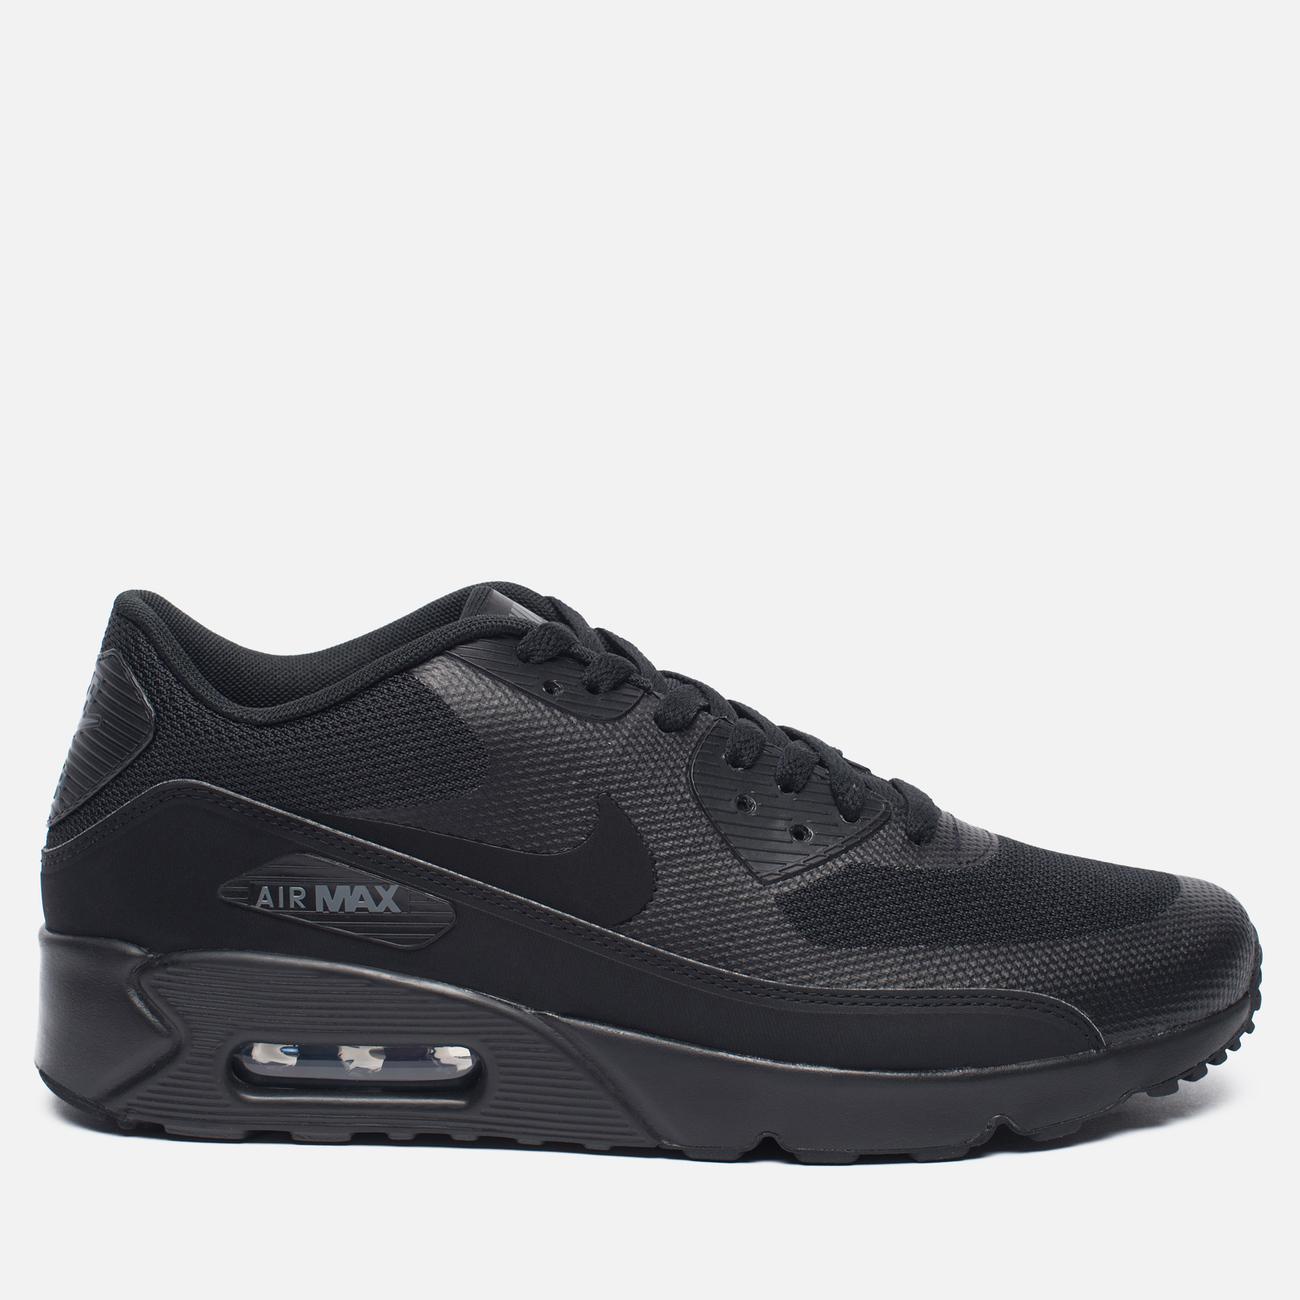 Мужские кроссовки Nike Air Max 90 Ultra 2.0 Essential 875695 002